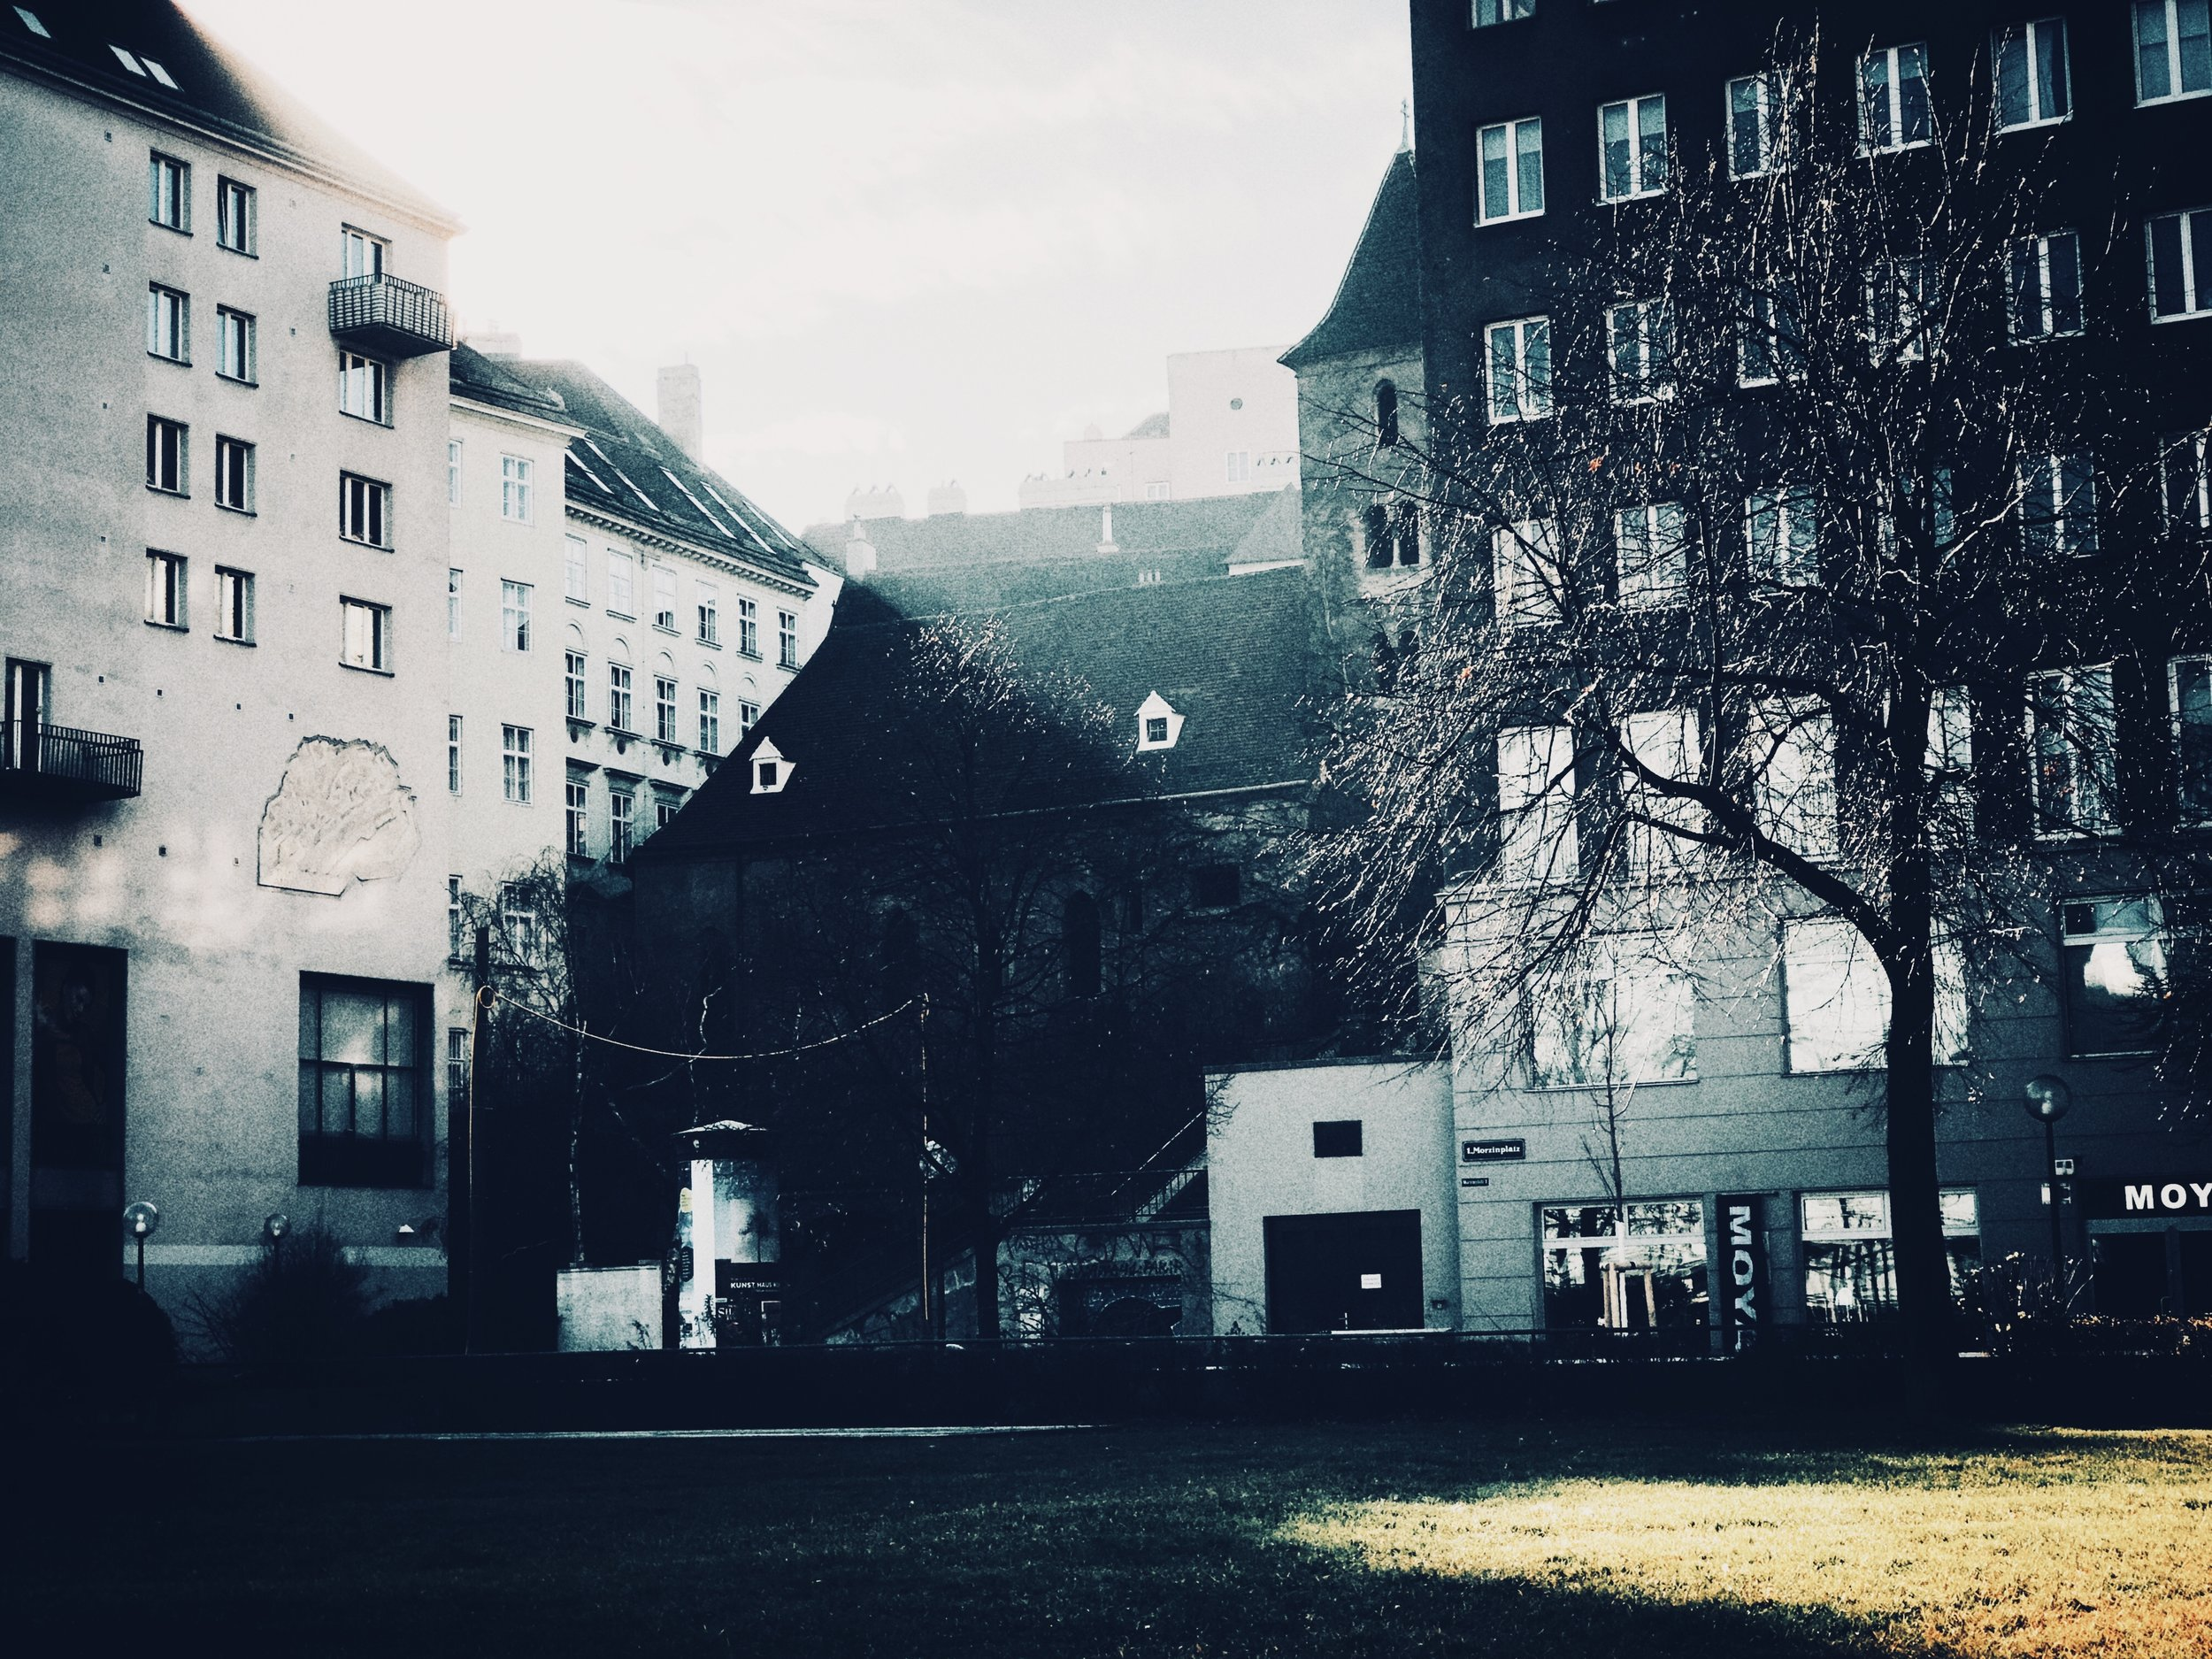 morzinzplatz, christmas morning